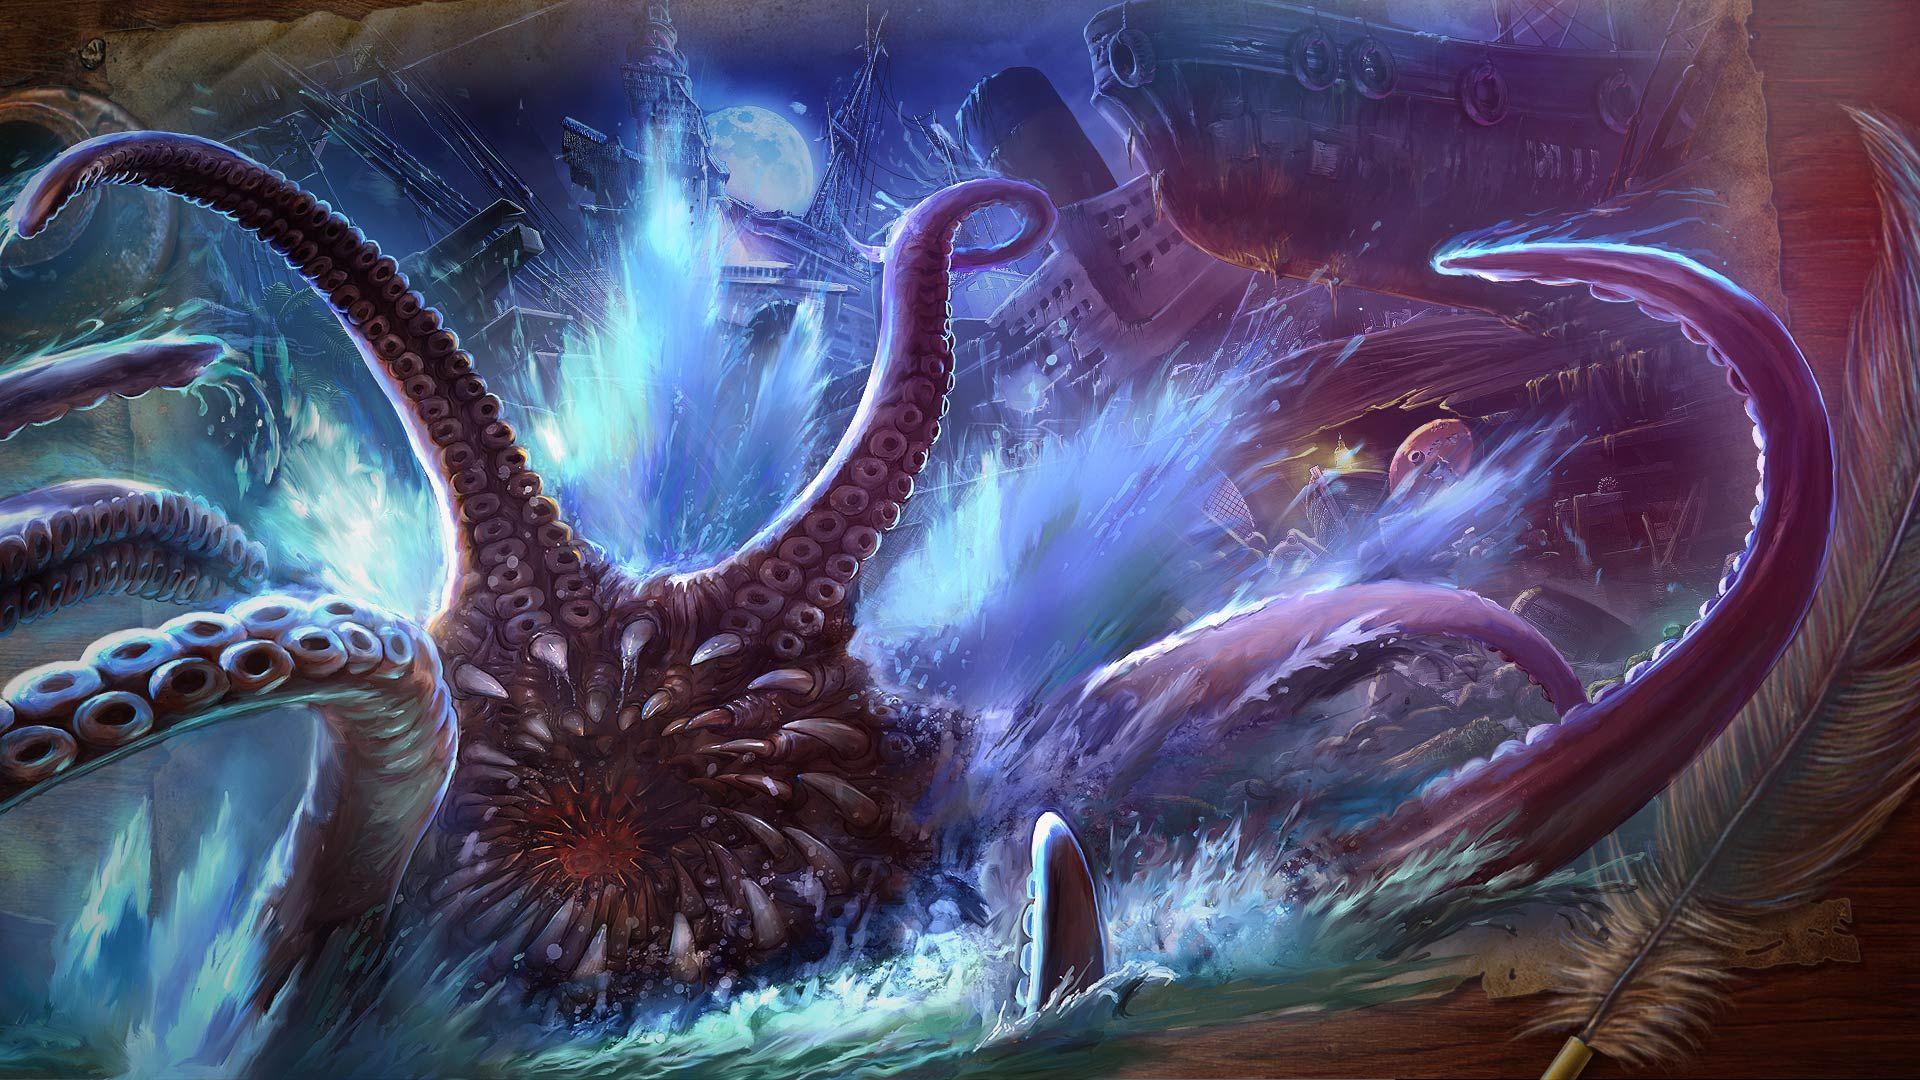 Nightmares From The Deep The Siren S Call Wallpaper Kraken Pirates Yarr Nightmare Siren Call Vox Machina